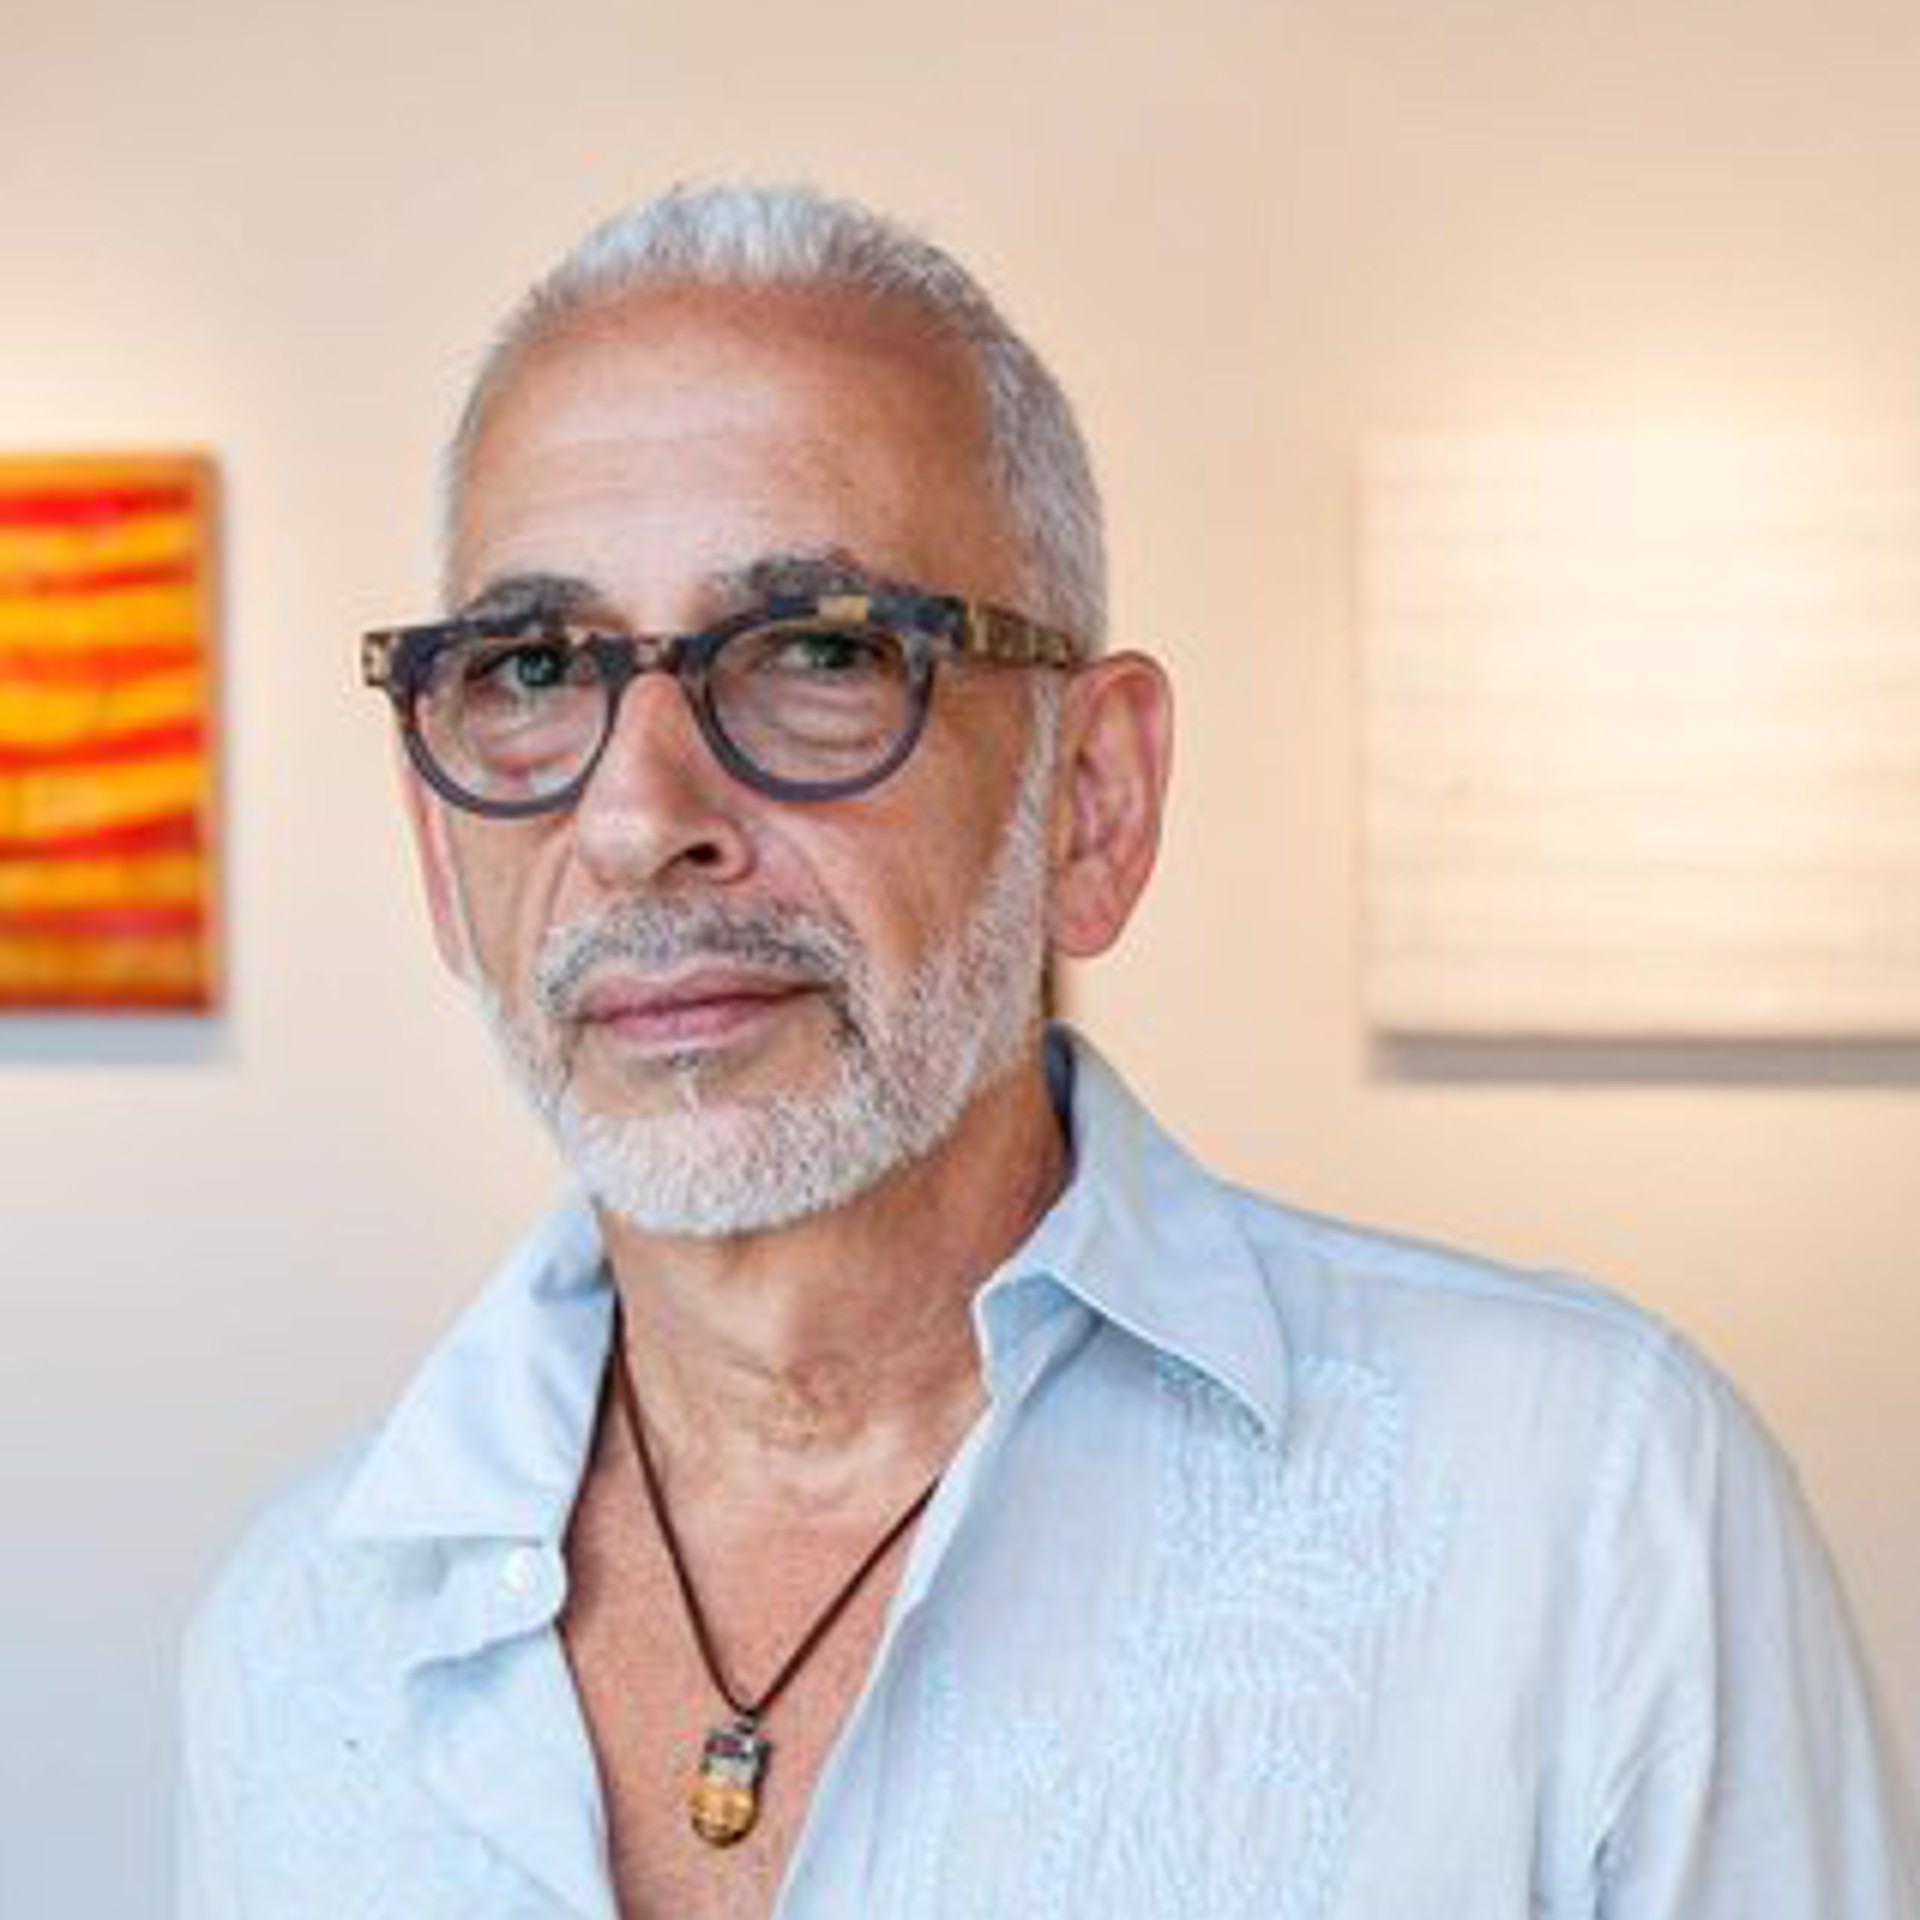 Juan Alonso-Rodriguez